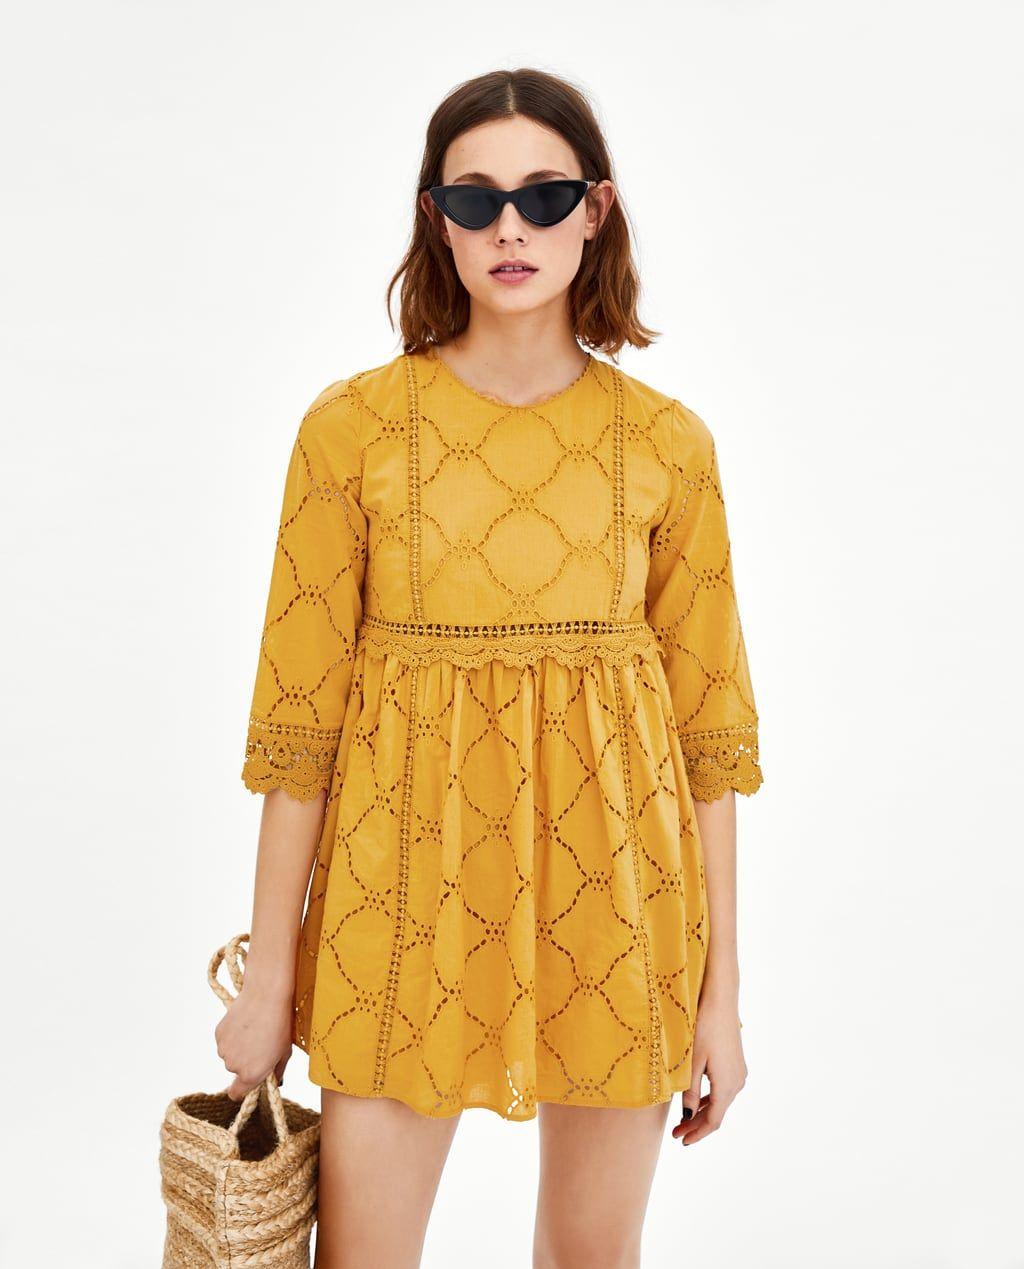 d71637953706 Cutwork Embroidery · VESTIDO MONO BORDADO PERFORADO Zara Dresses